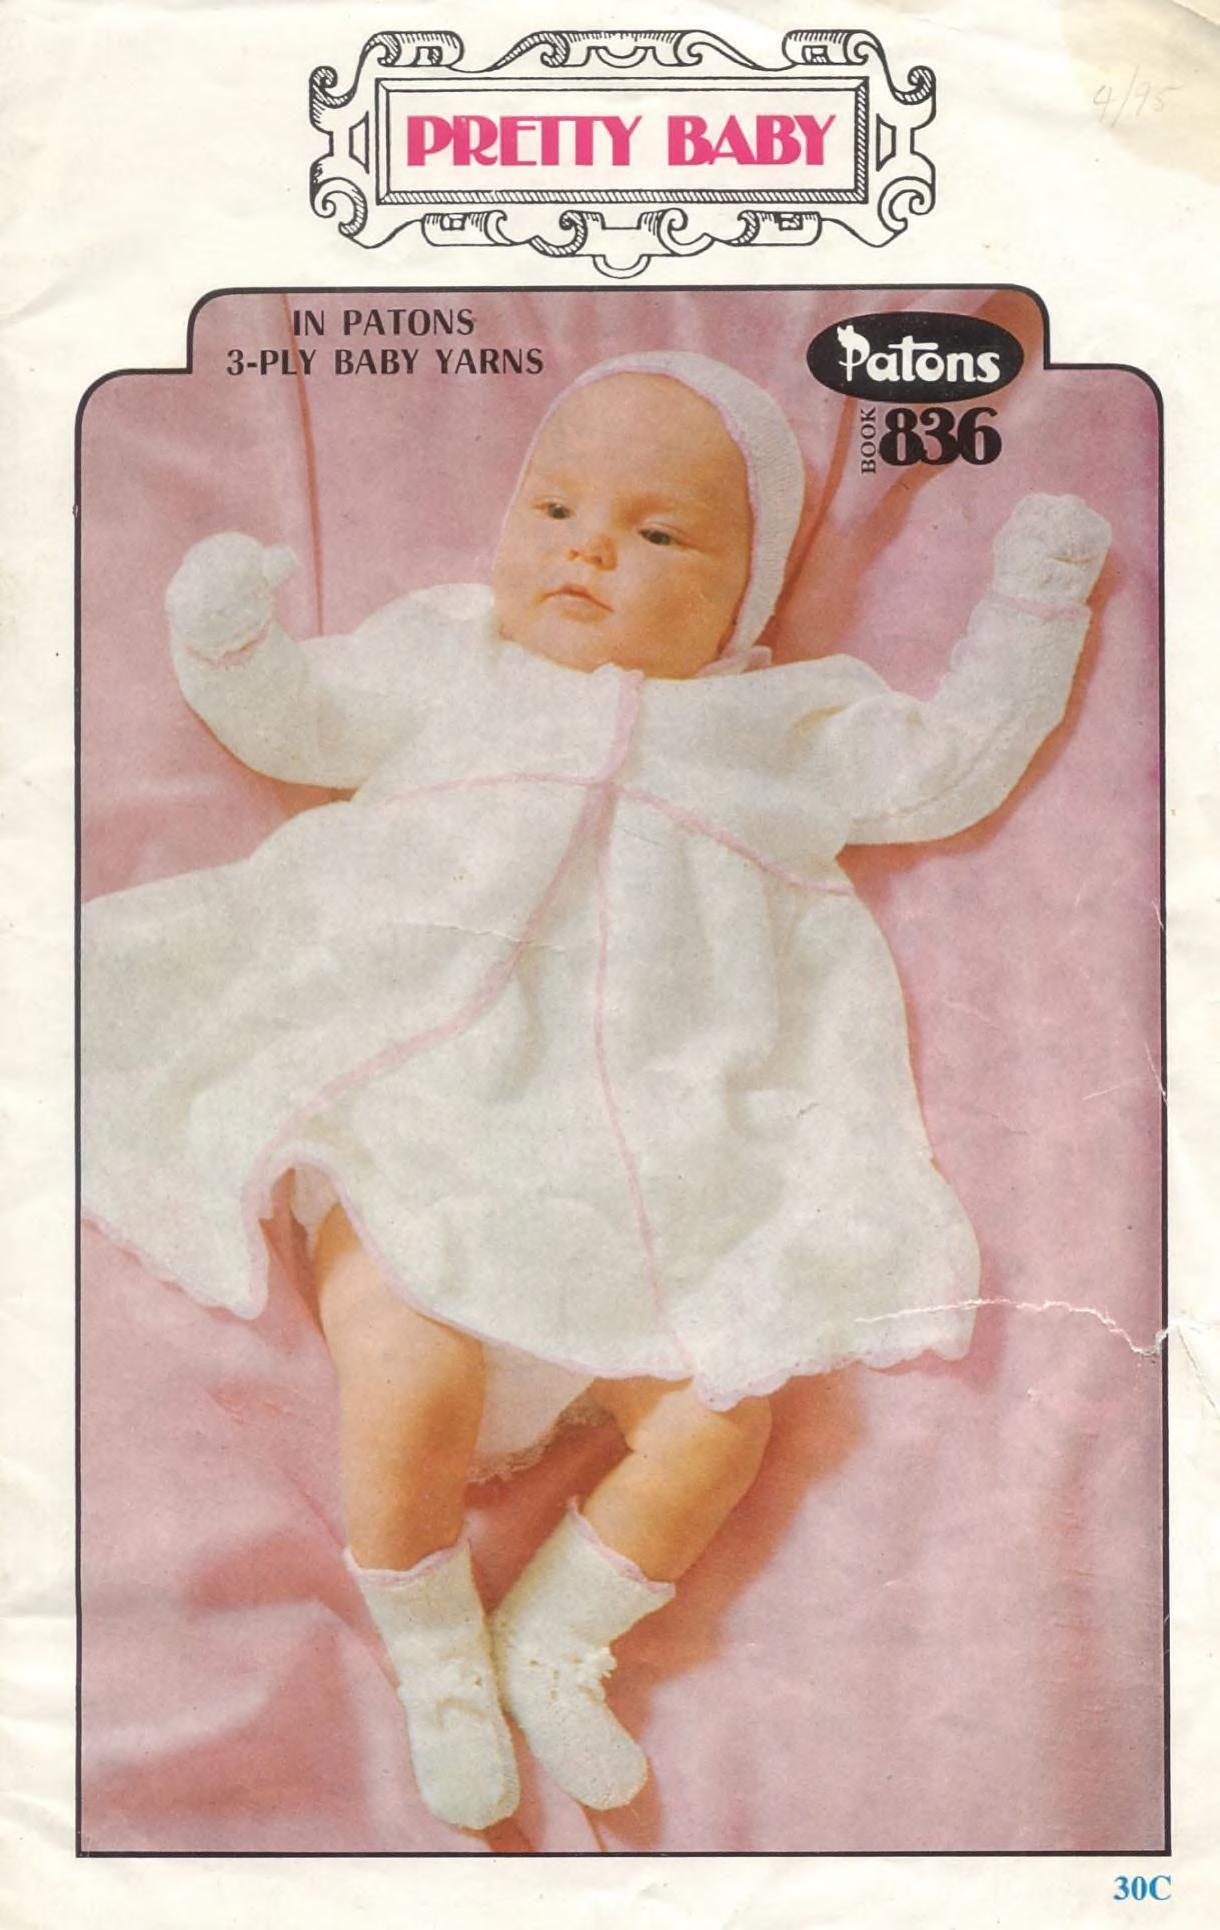 be2b49dbab08 Patons 836 Pretty Baby